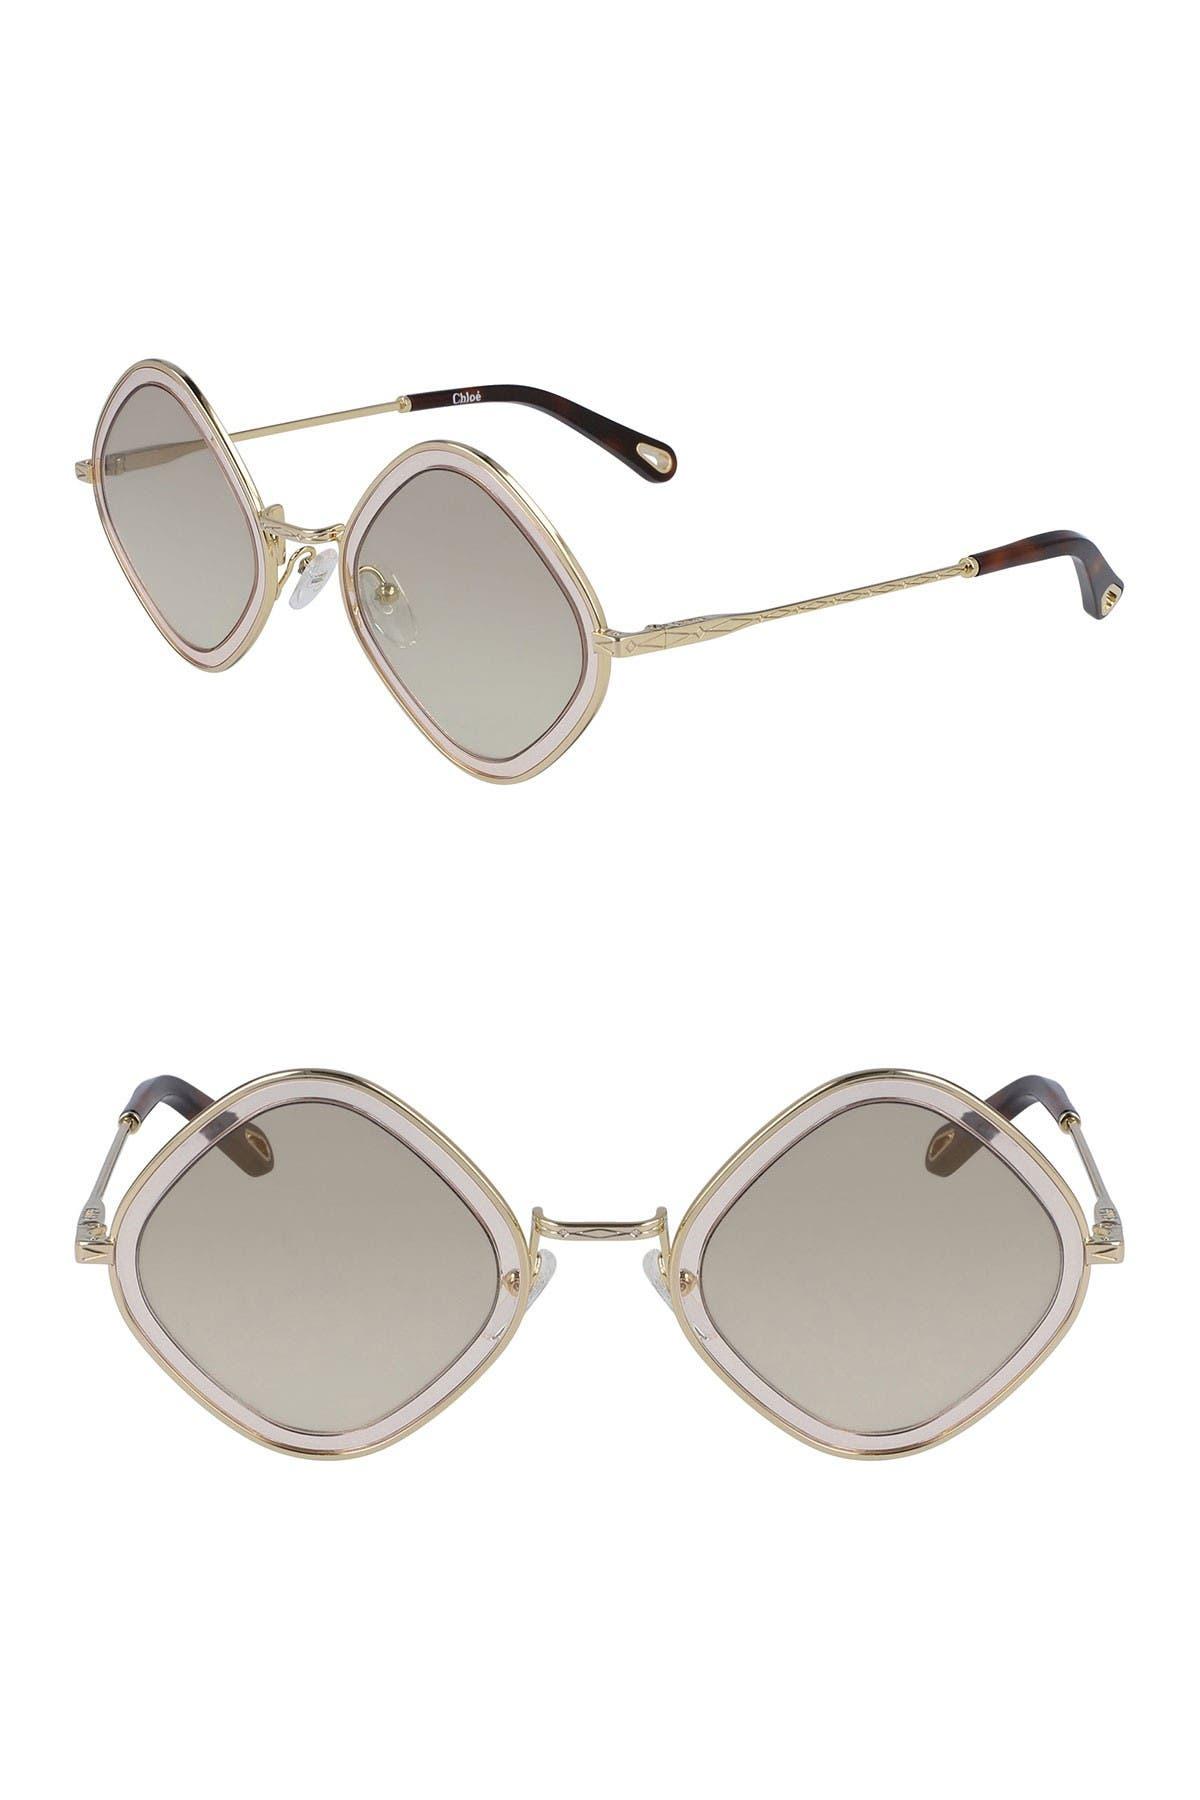 1960s Sunglasses | 70s Sunglasses, 70s Glasses Chloe Mod Rectangle 55mm Sunglasses Size NONE - Gold Lt Pinkgrd Brn at Nordstrom Rack $79.97 AT vintagedancer.com